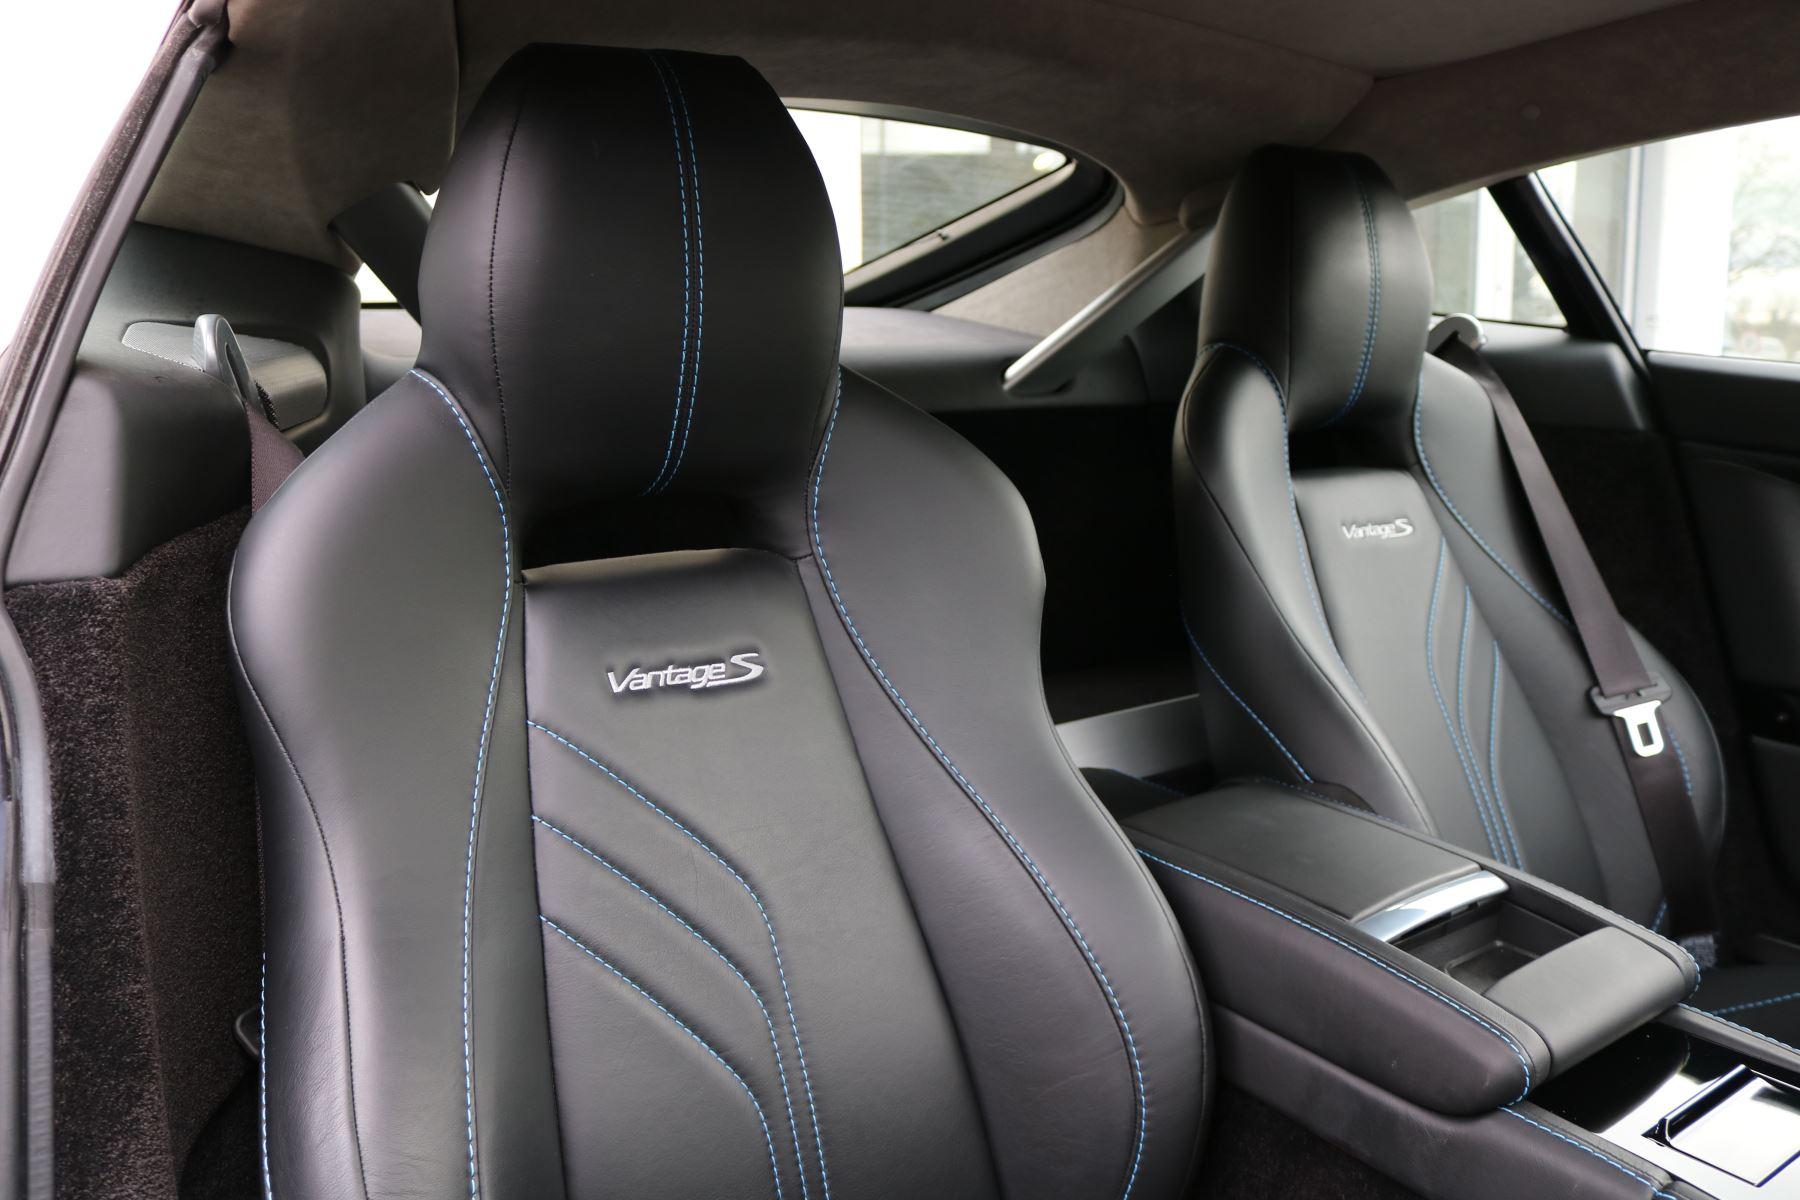 Aston Martin V8 Vantage S S 2dr Sportshift image 22